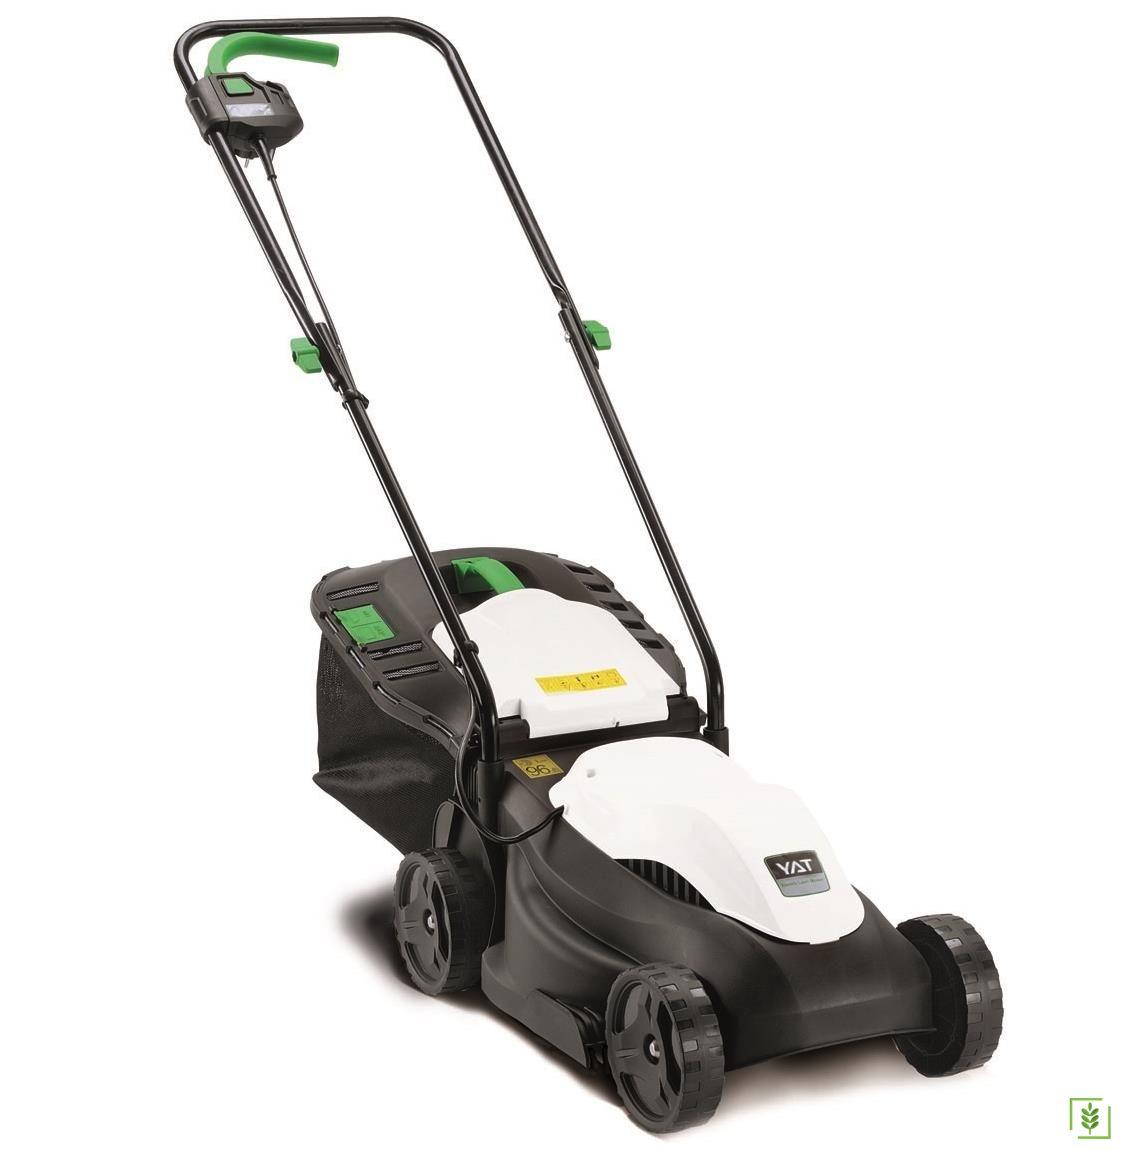 Yat YT5139 Elektrikli Çim Biçme Makinası 1000 w